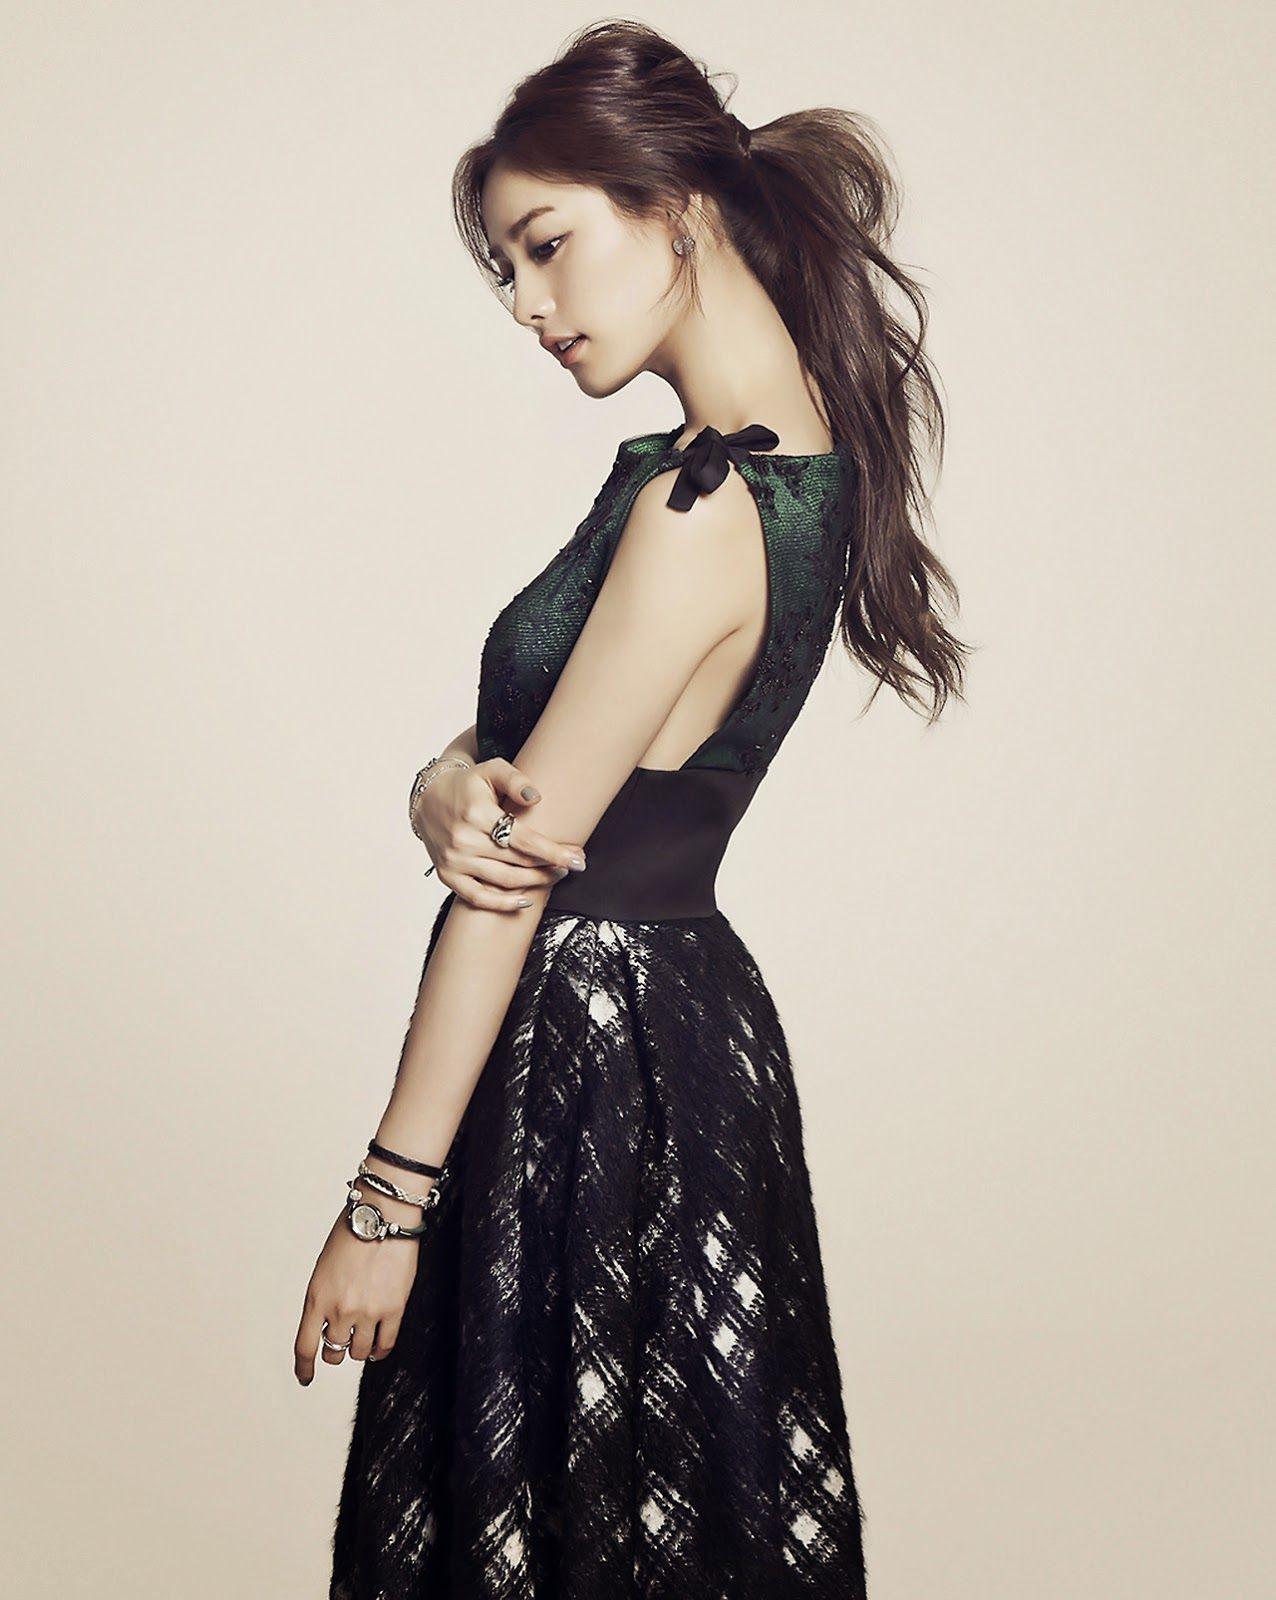 Nana(나나); Im Jin-ah (임진아), 1991년 9월 14일, After School